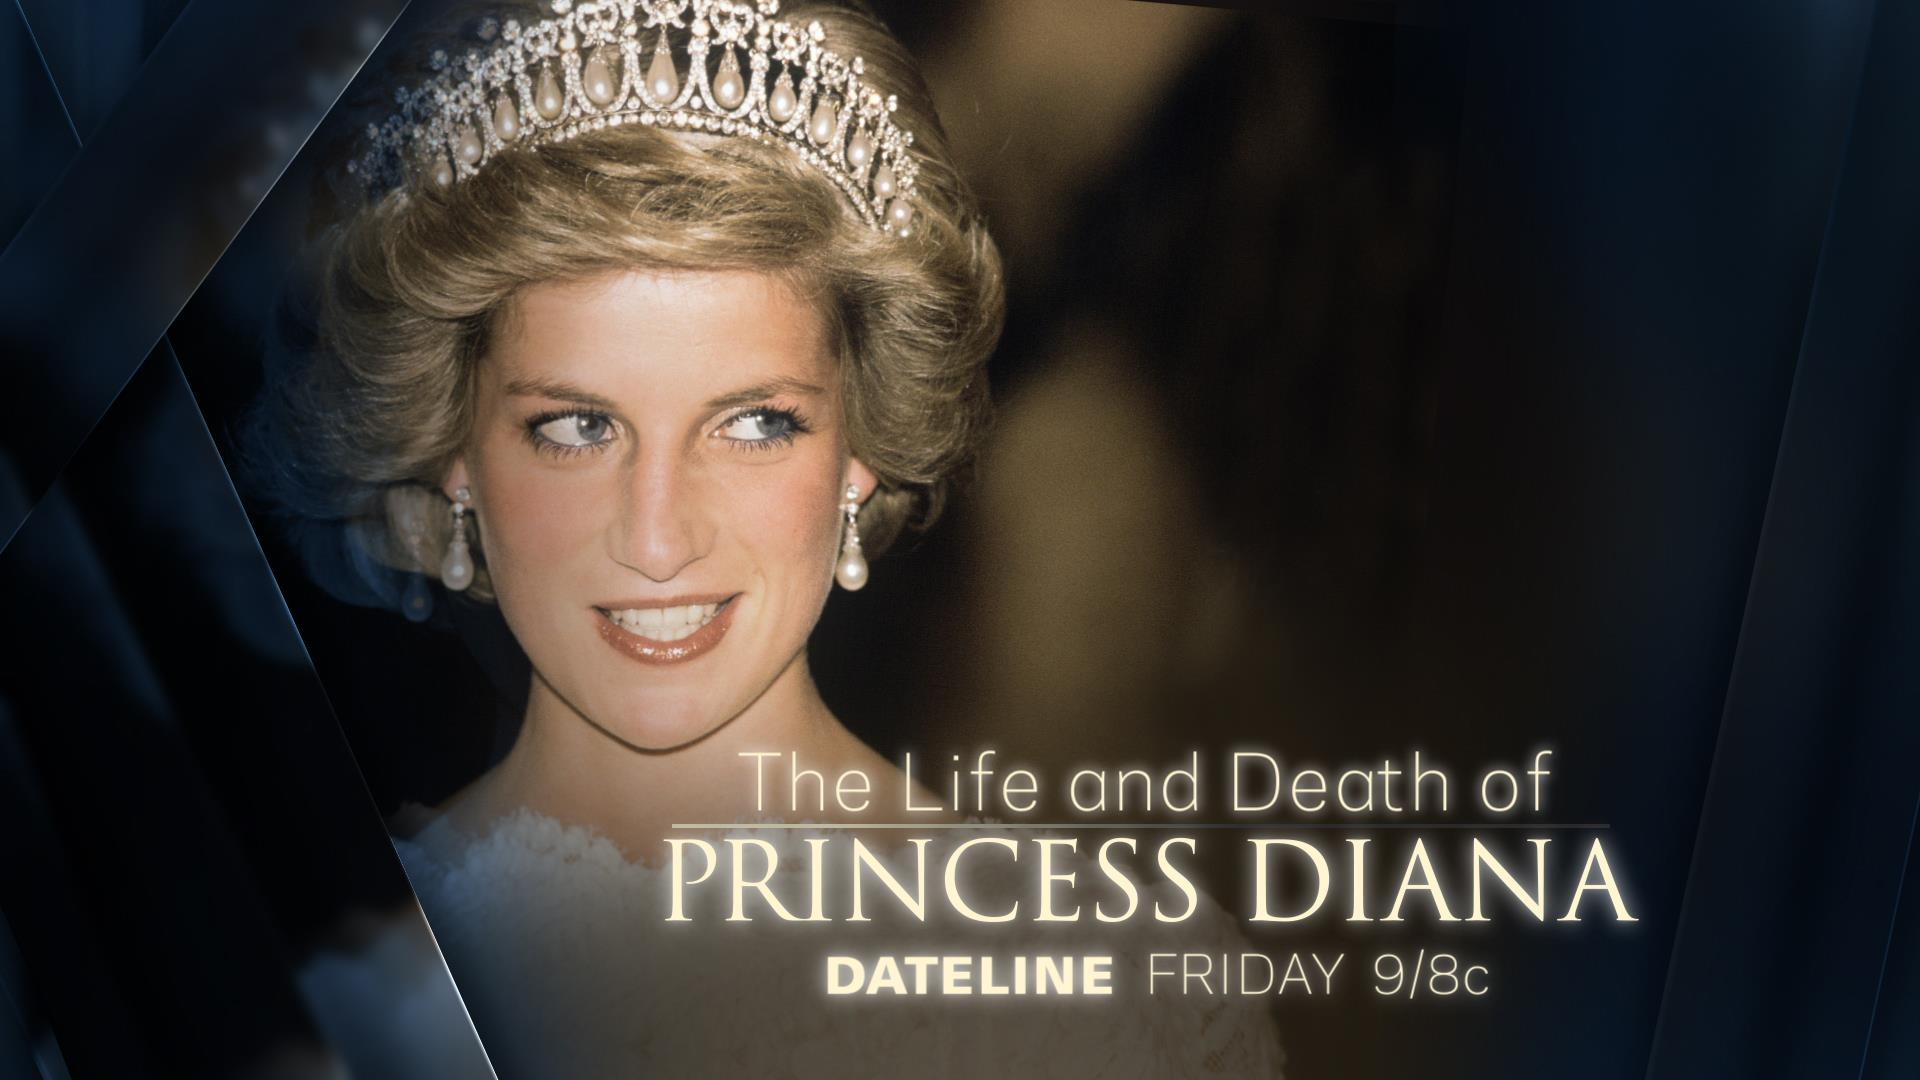 100 Lady Diana Princess Diana U0027s Language Of Fashion Images, Photos, Reviews